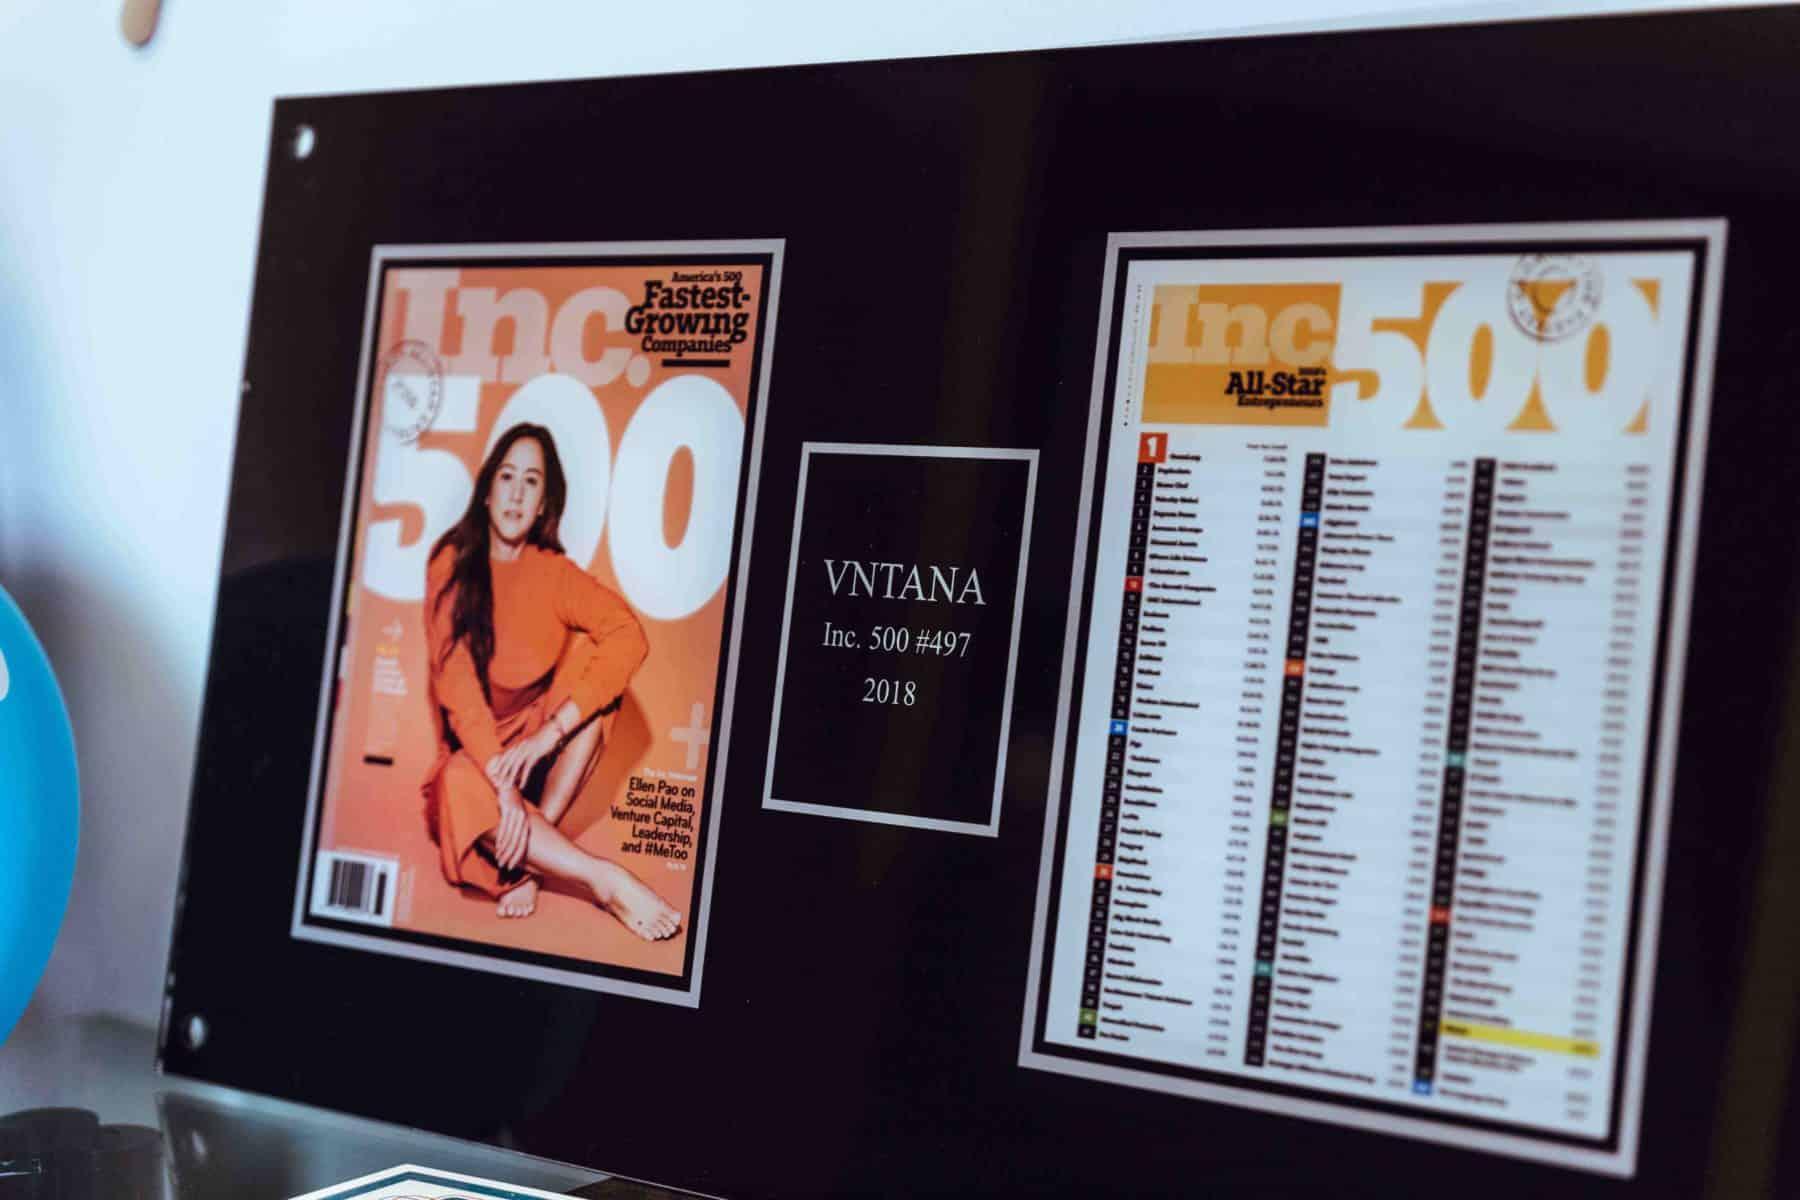 INC 500 vntana the future party 04